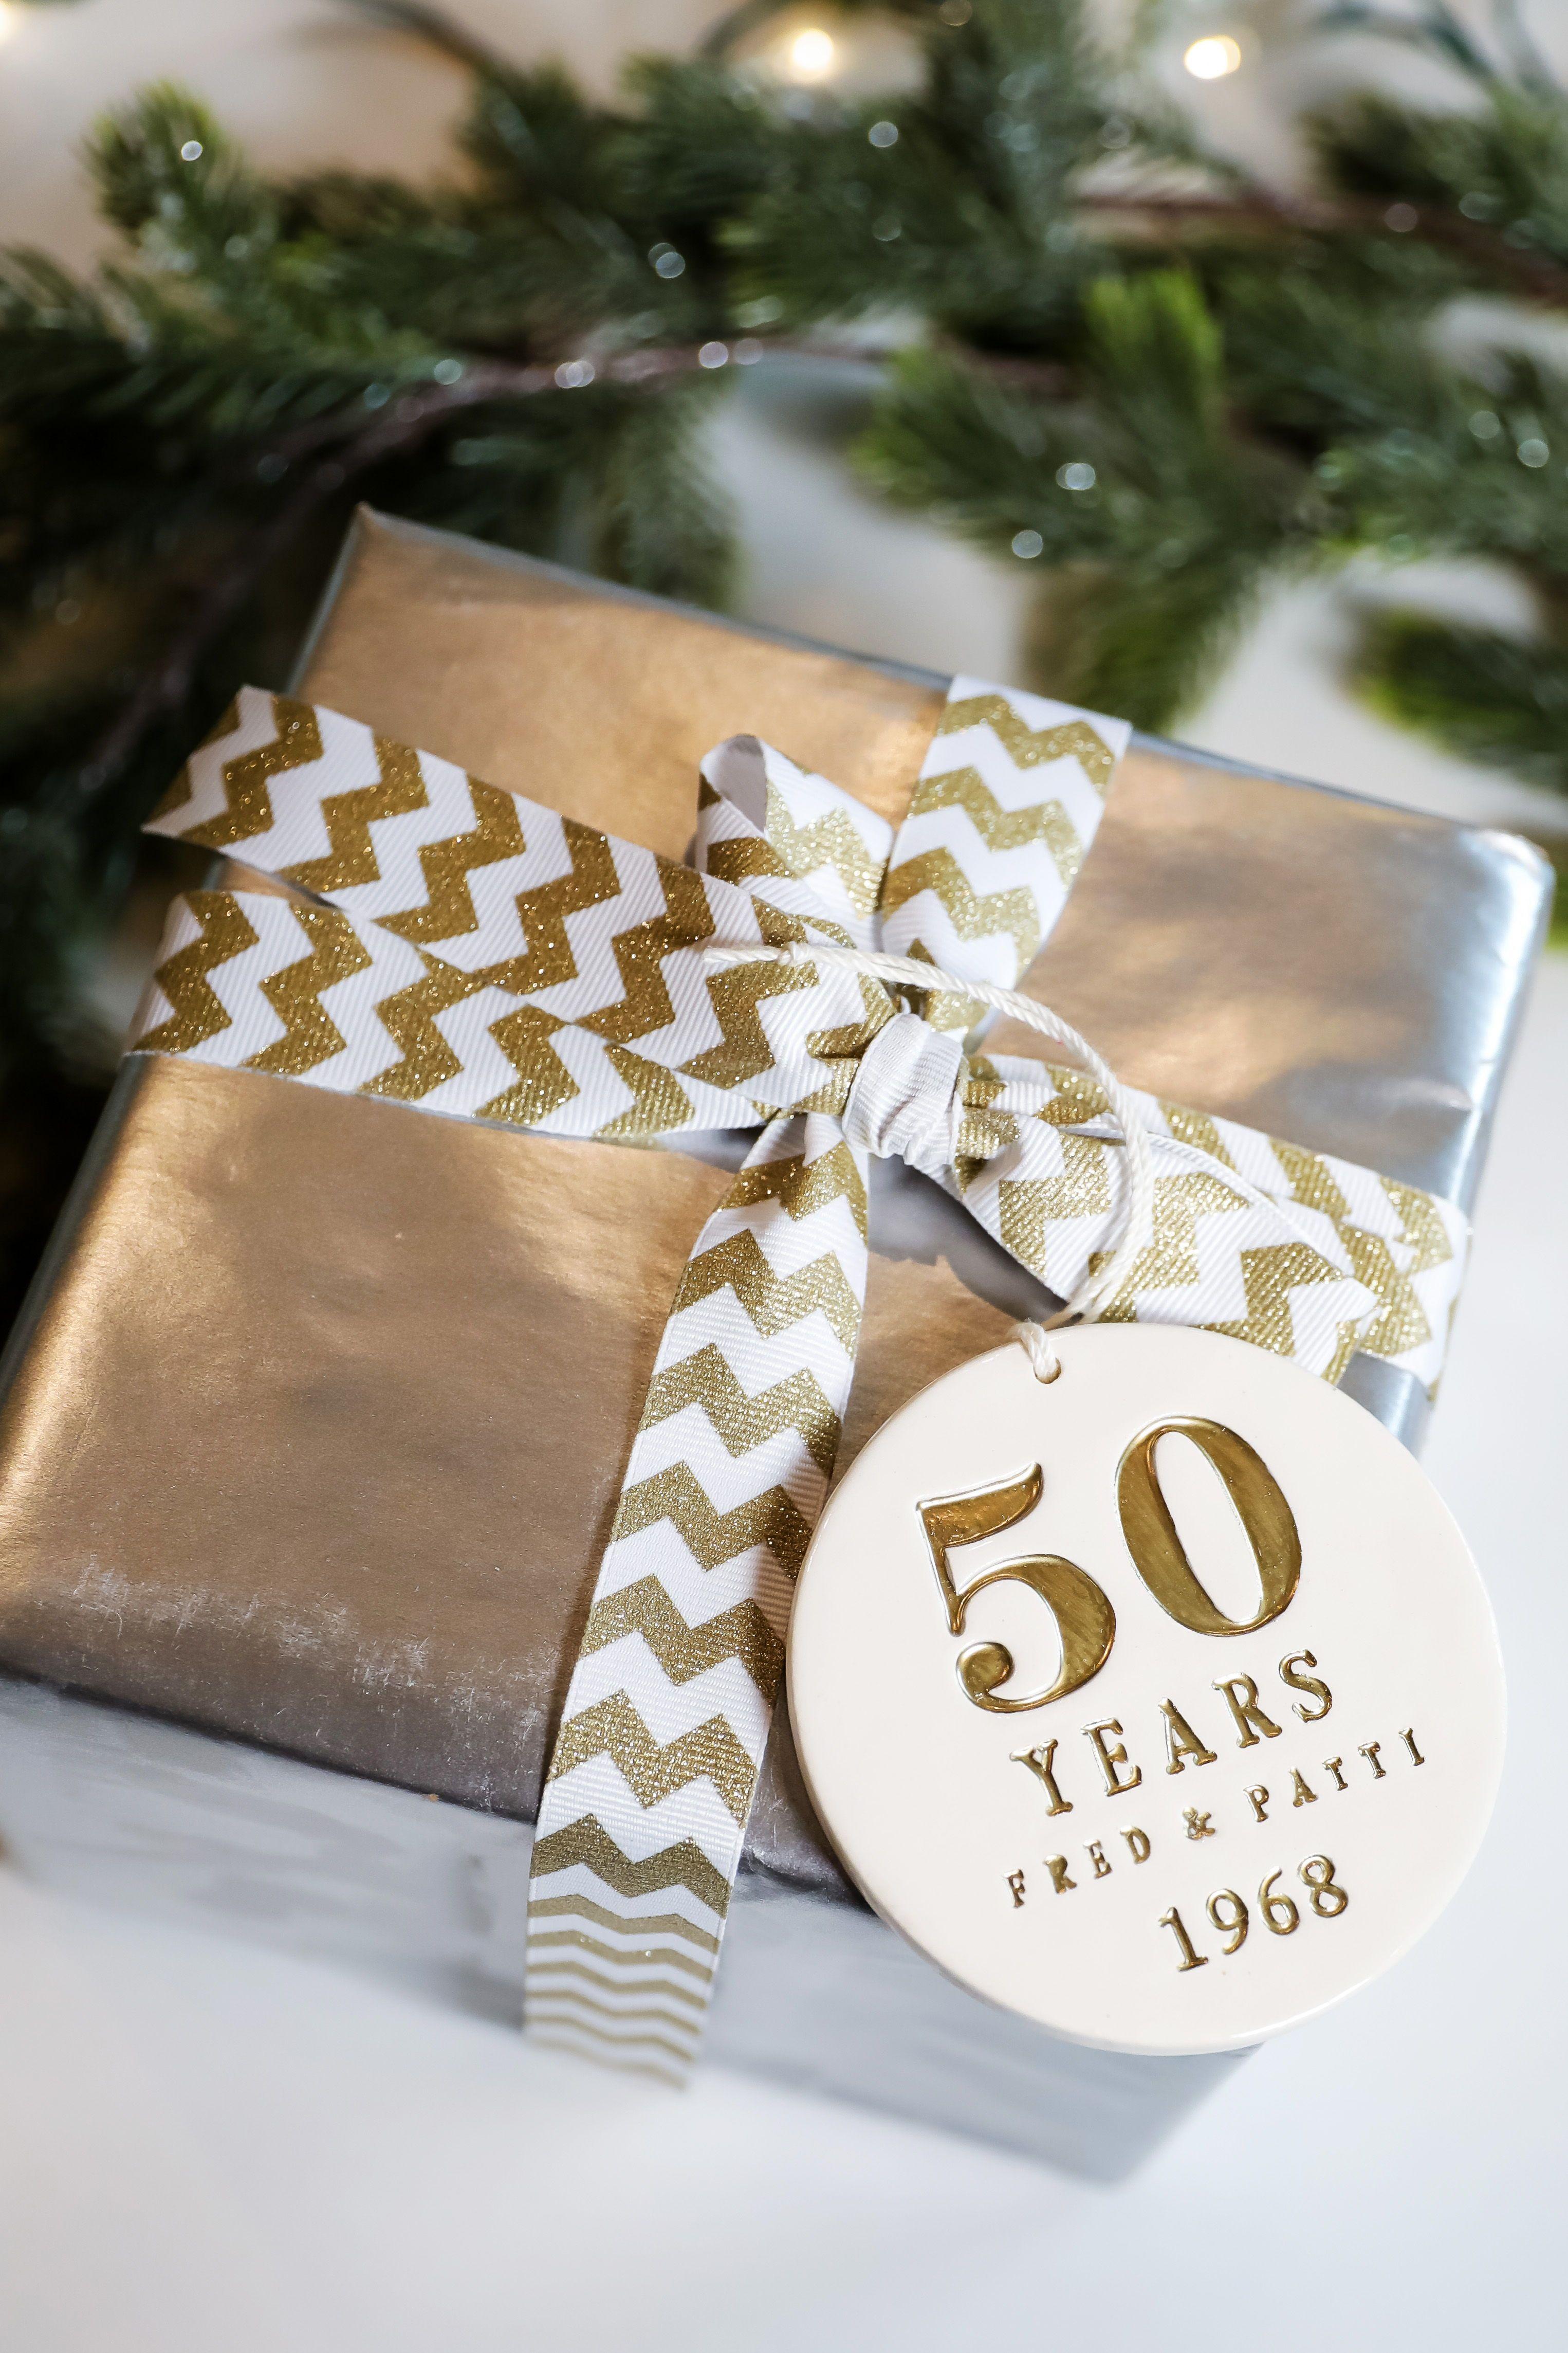 50th anniversary gift golden anniversary gift 50th